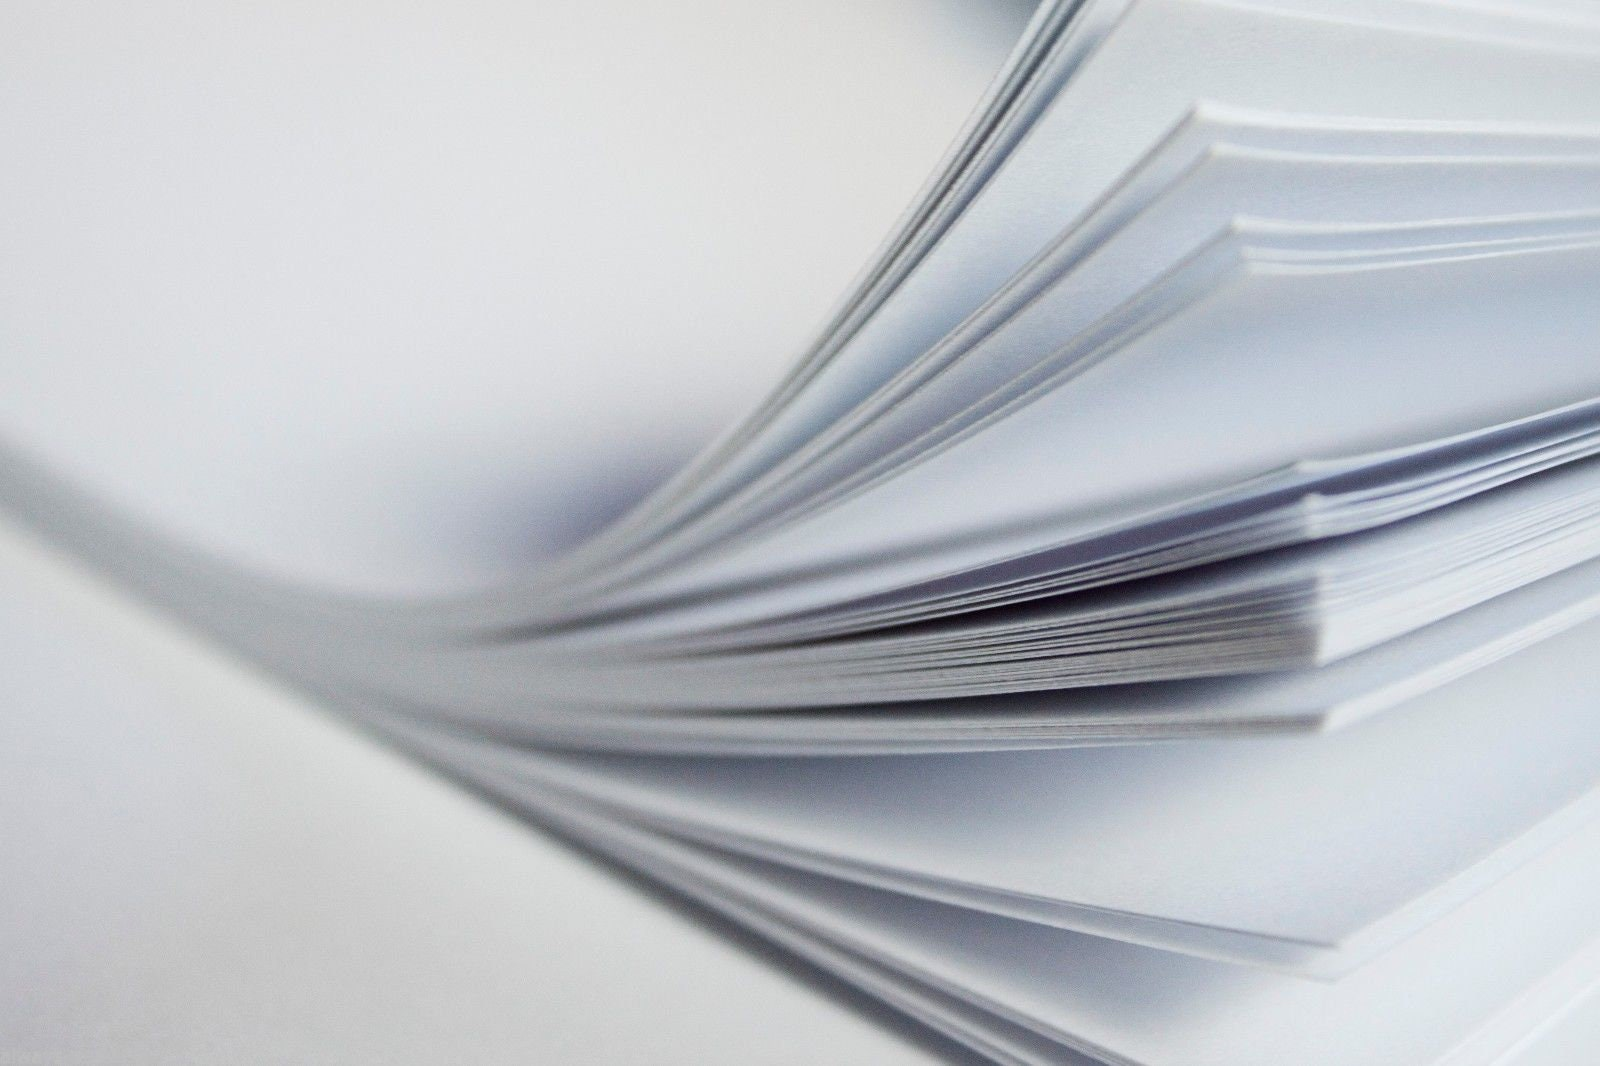 "100 Wyndstone New Trans 55 Hot Split Heat Transfer Paper 120m 60# 8.5/"" x 11/"""